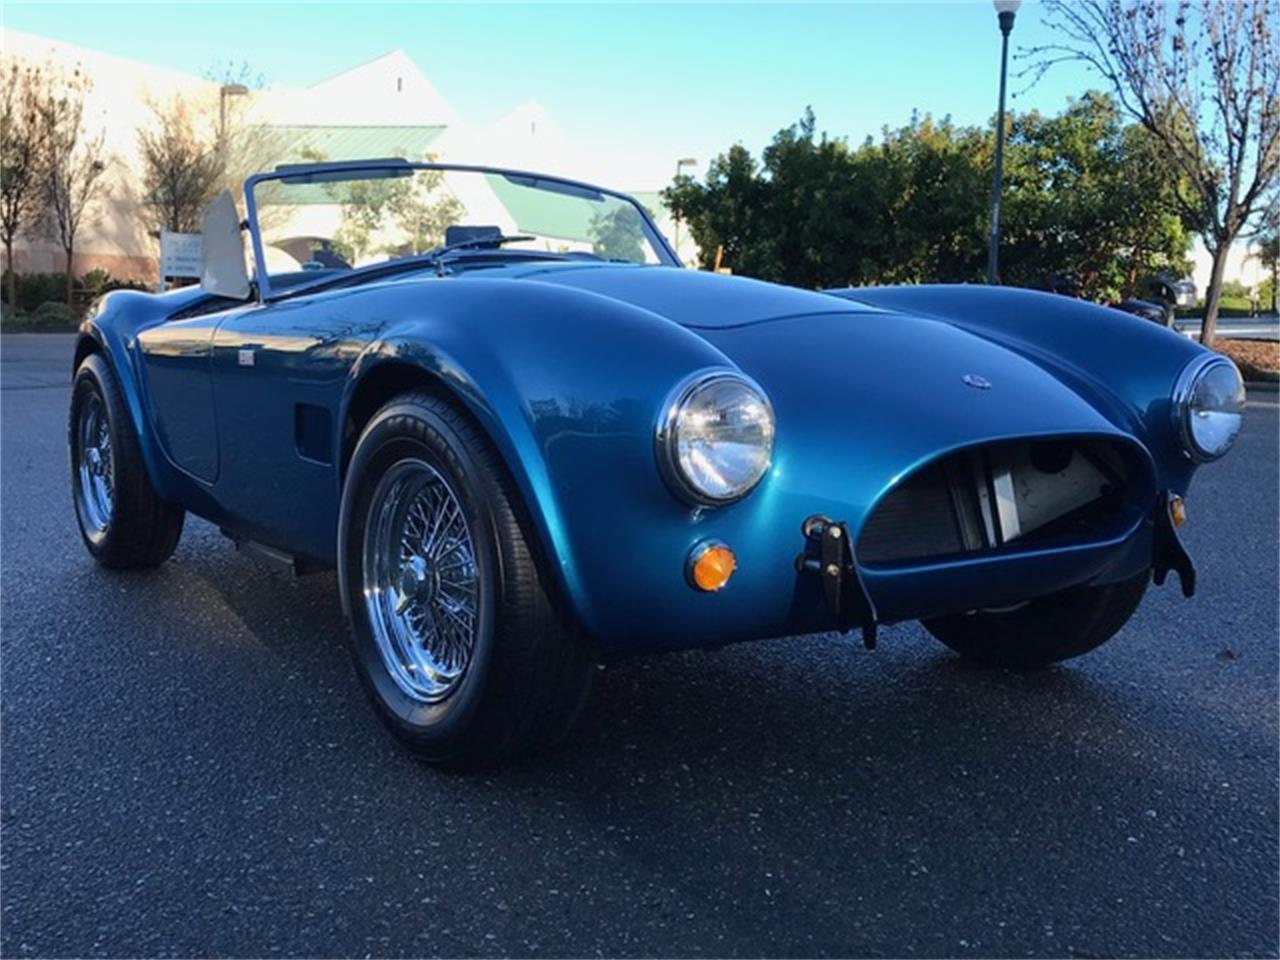 For Sale: 1963 Shelby Cobra in Napa Valley, California